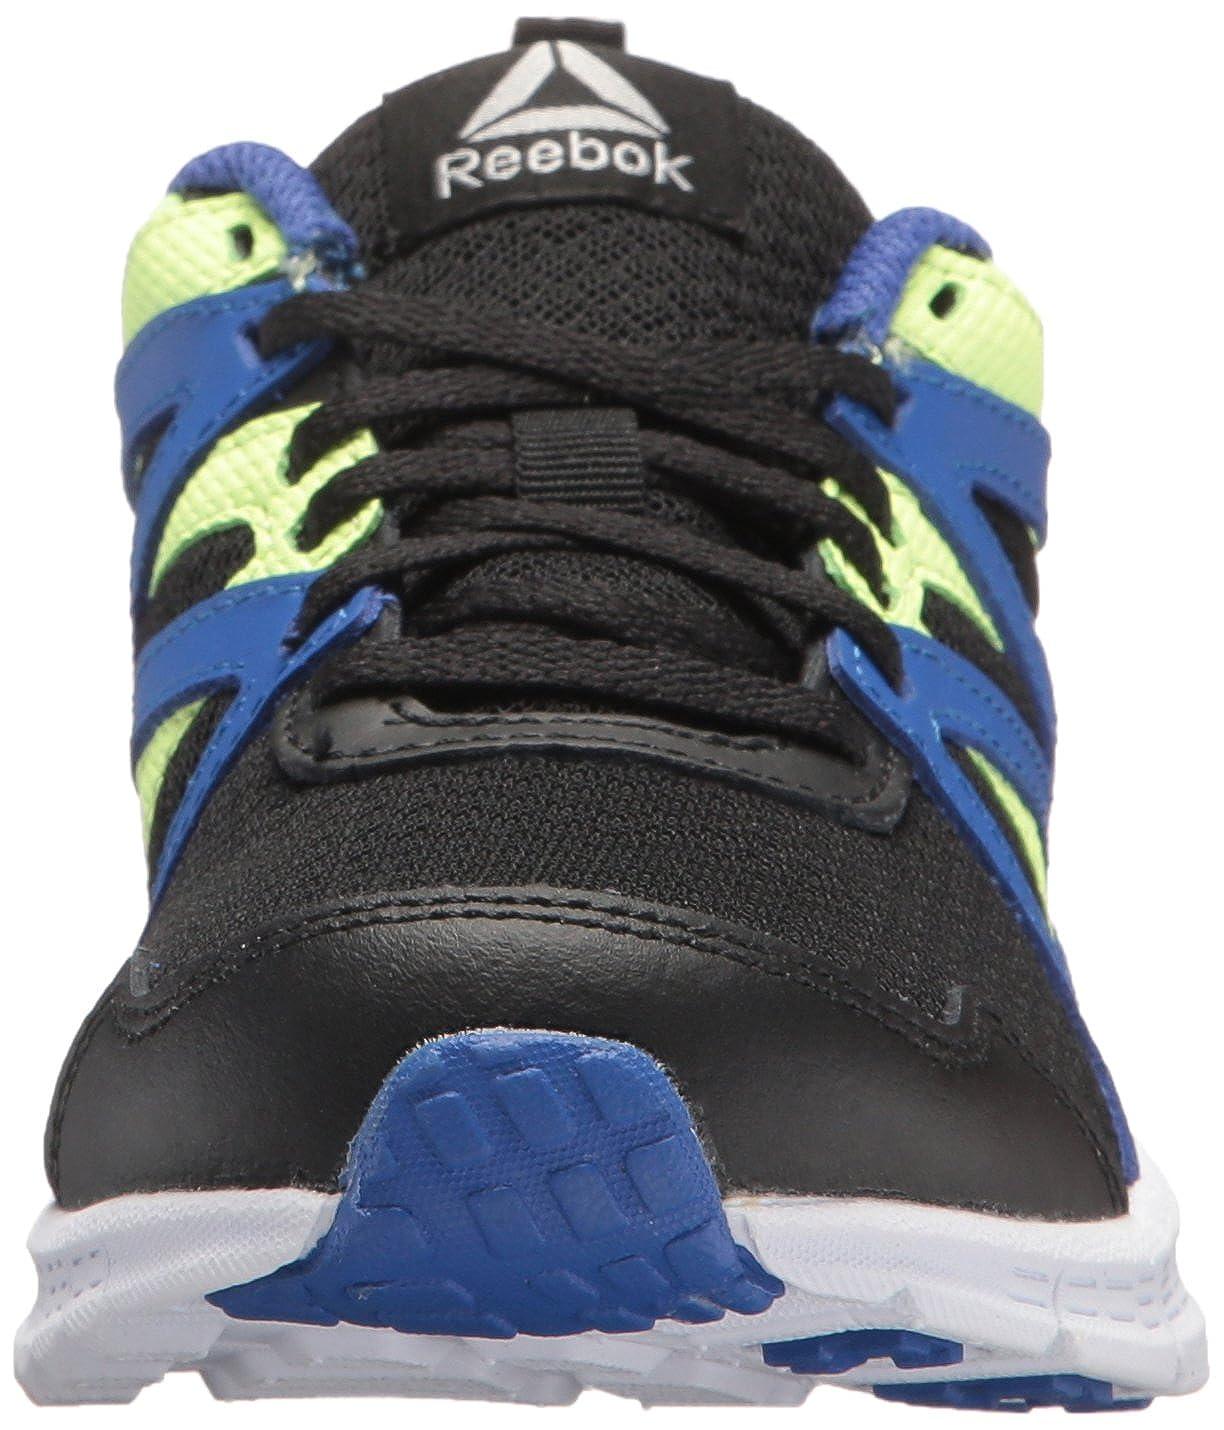 efd09efaf Amazon.com   Reebok Run Supreme 2.0 Track Shoe (Little Kid/Big Kid)    Running